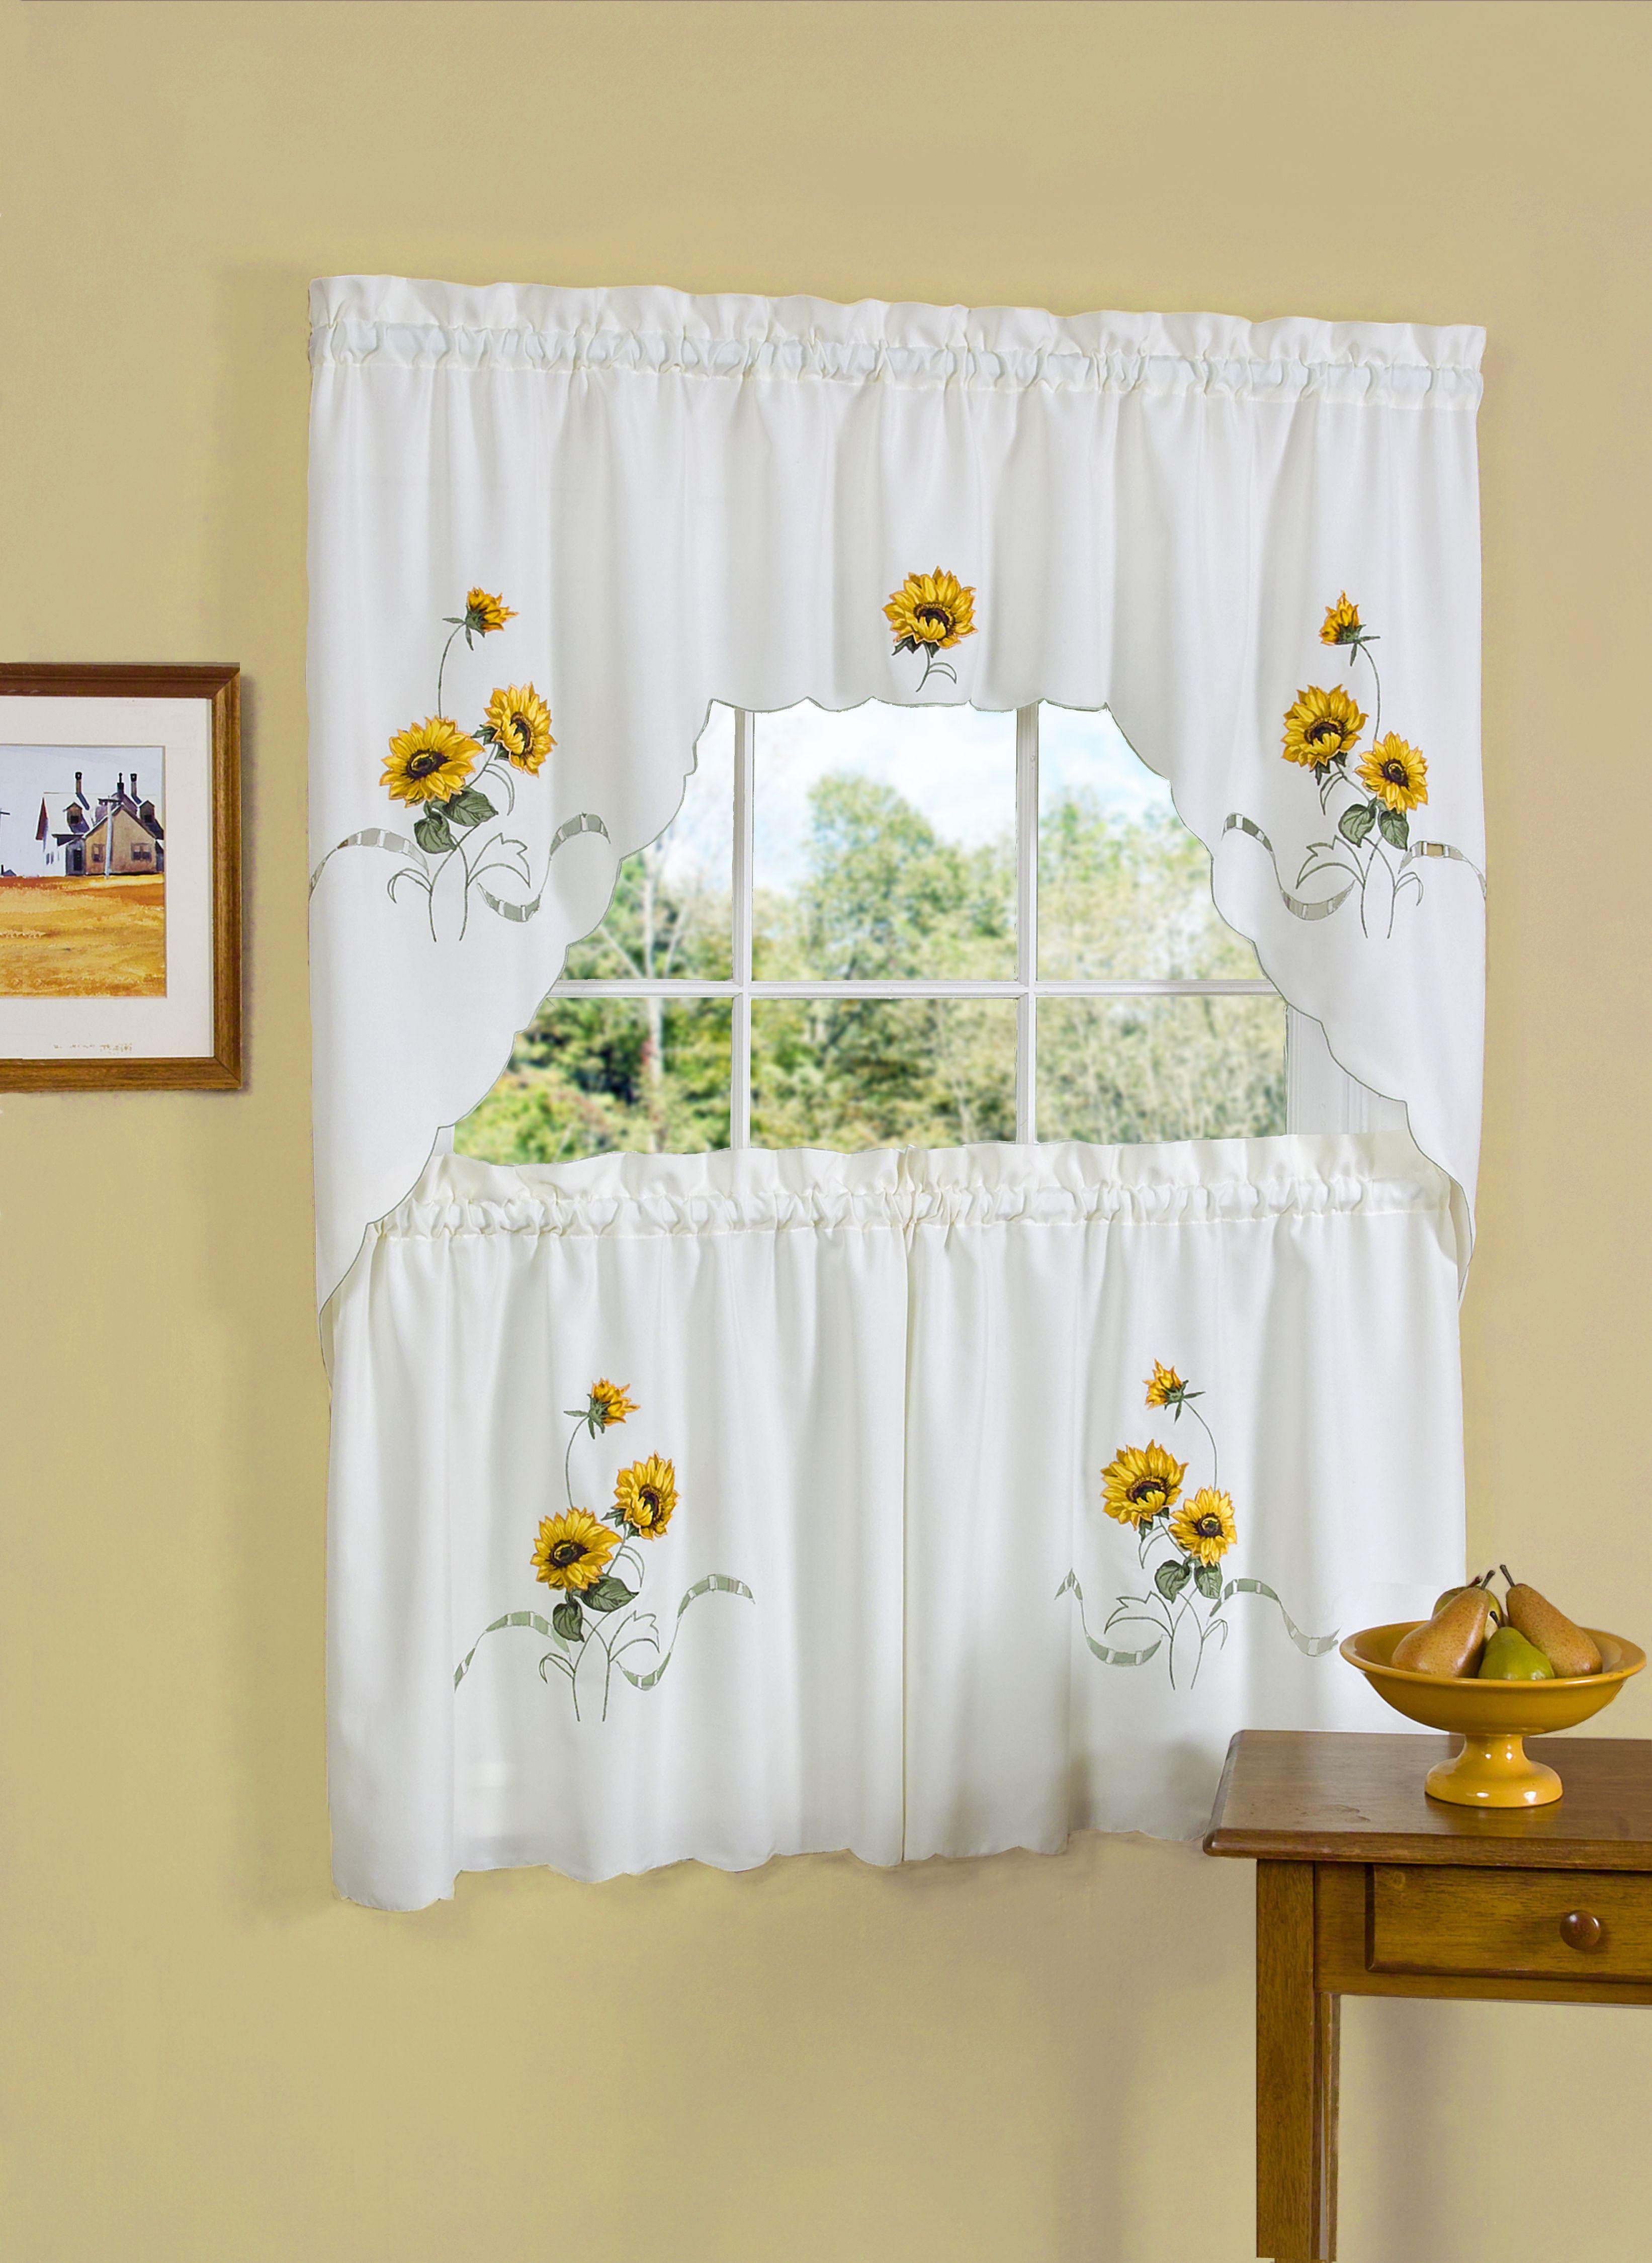 Sears Com Sunflower Curtains Kitchen Curtain Sets